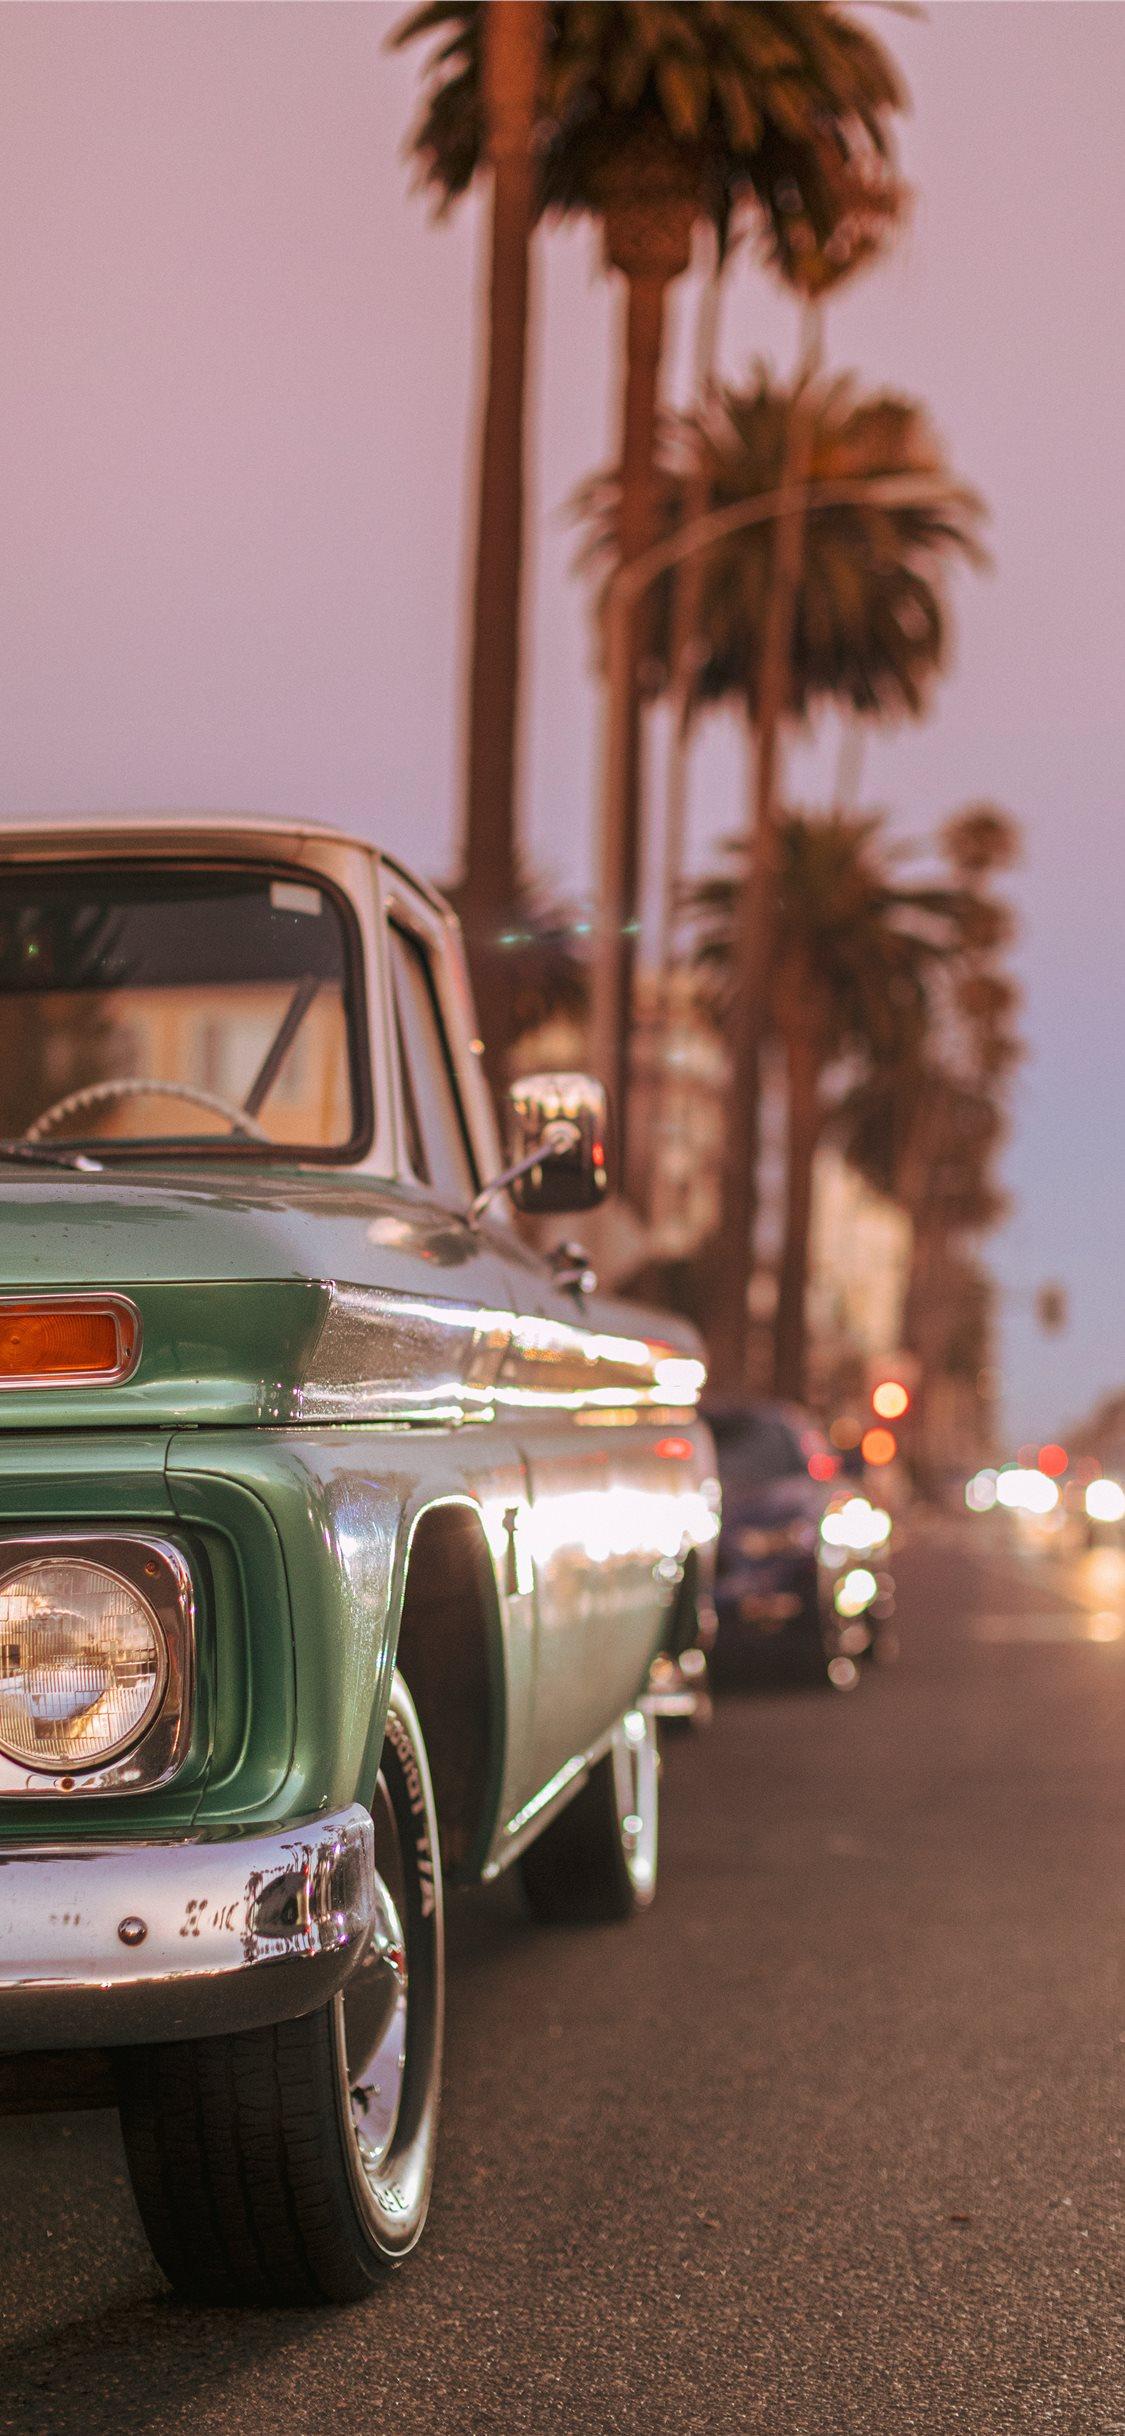 Vintage car parked on Ocean Blvd during sunset  iphone x wallpaper ilikewallpaper com